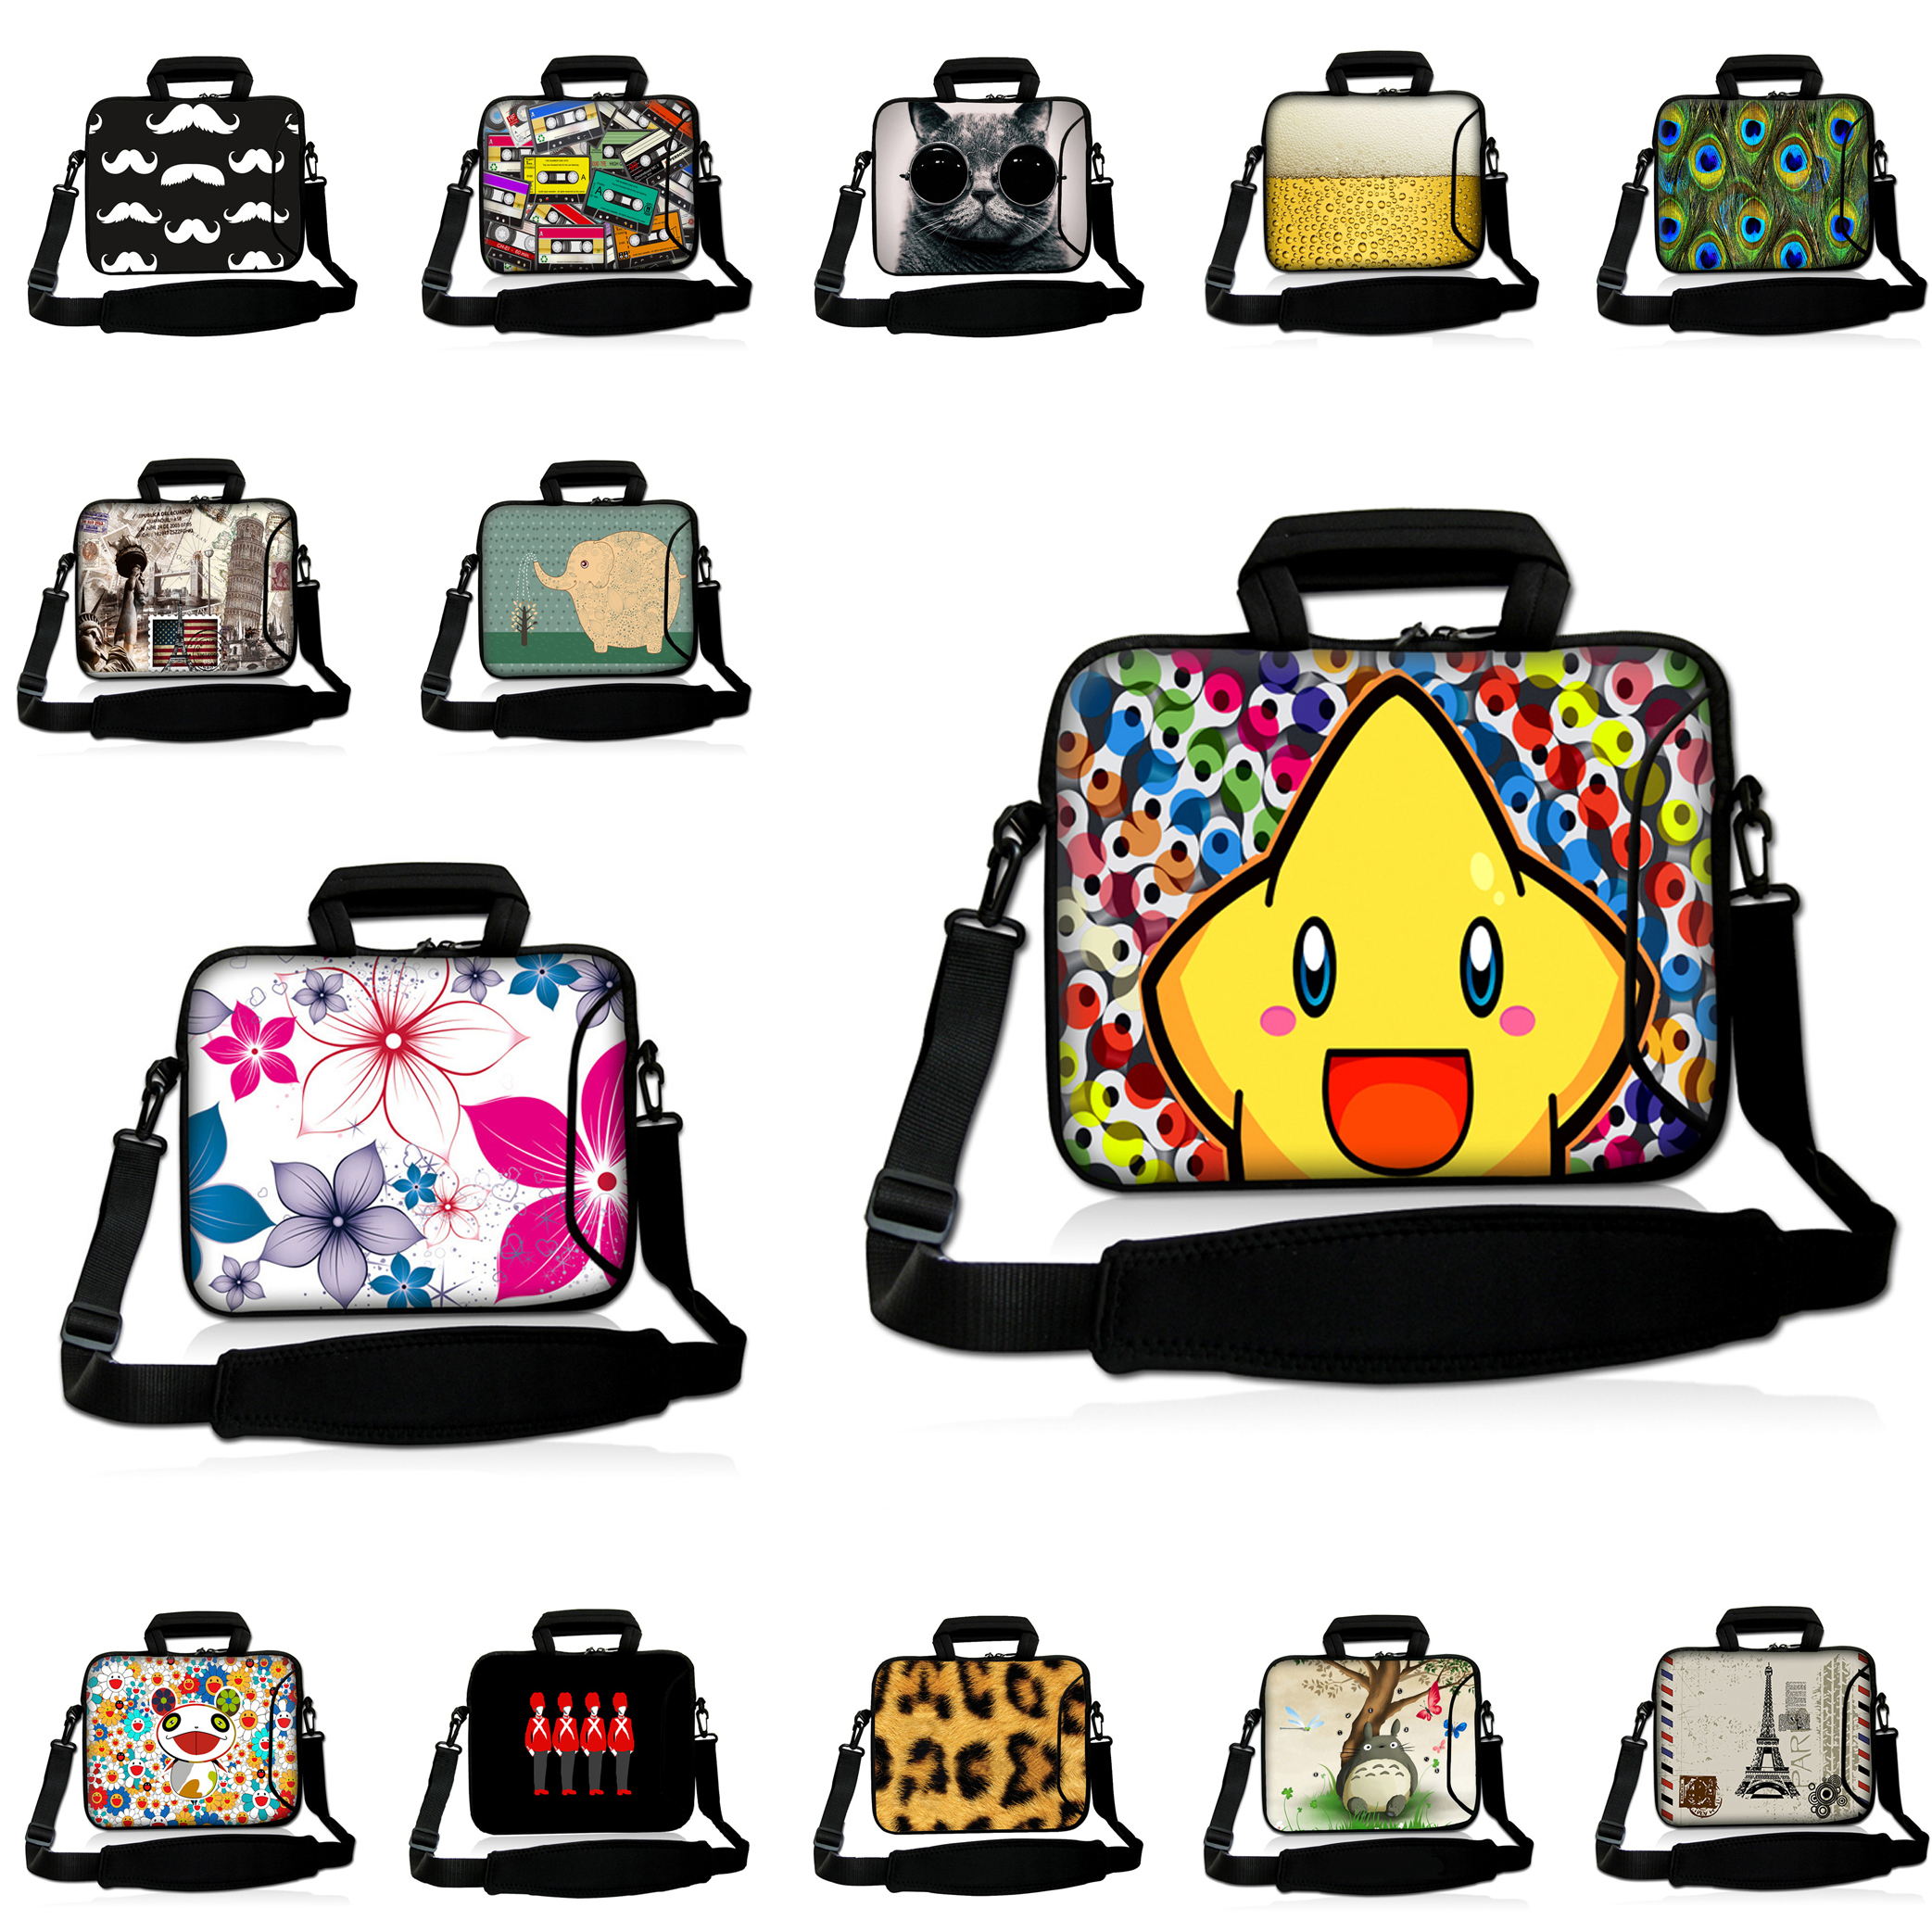 2017 Universal 10 12 13 14 15 15.4 15.6 17 17.3 Laptop Messenger Carry Bag Zippers Computer Shoulder Strap Bag Cases Cover Pouch<br><br>Aliexpress